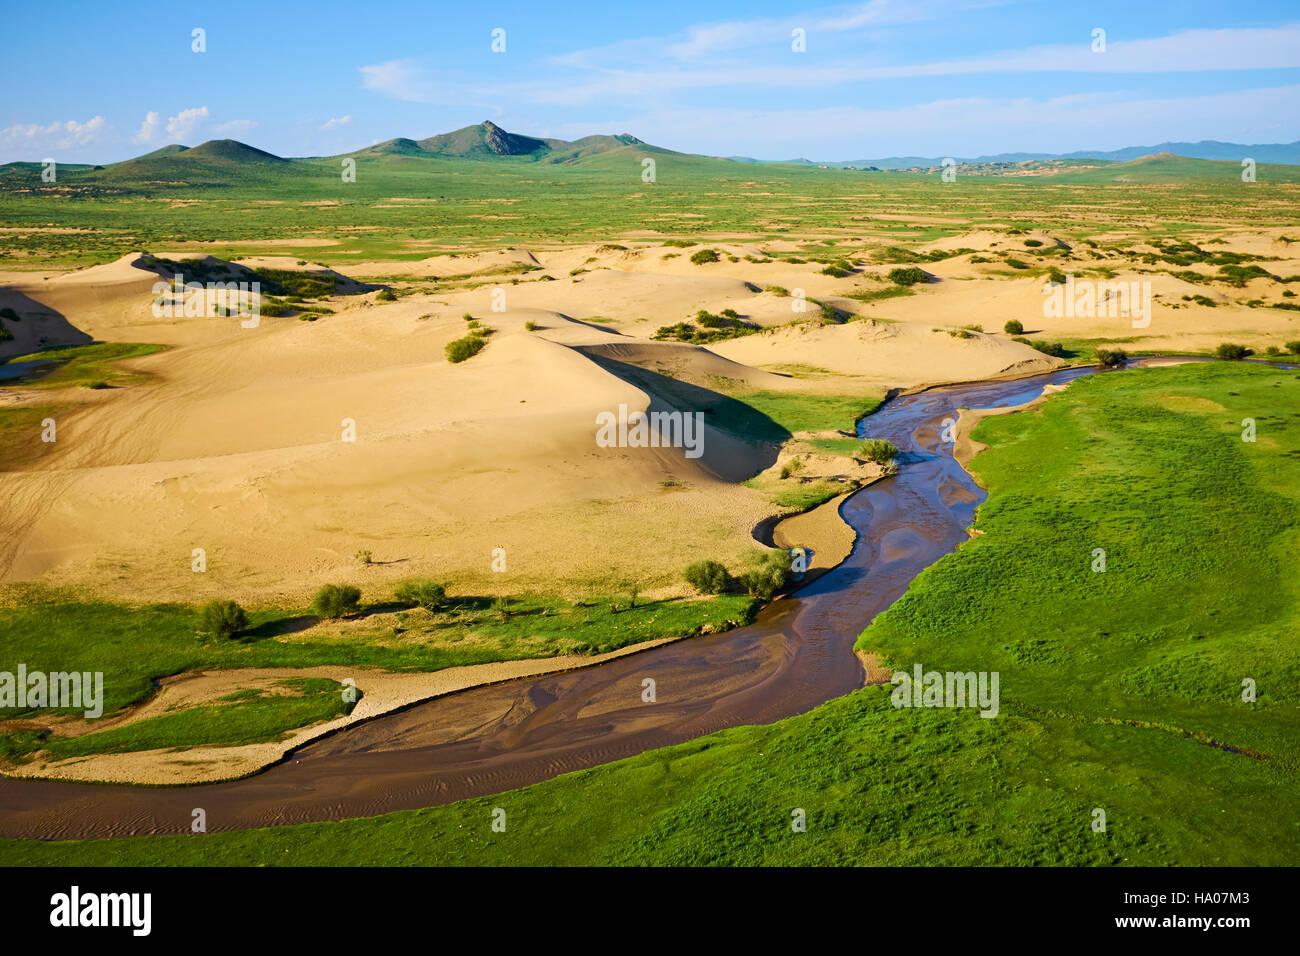 Mongolia, Ovorkhangai province, sand dune at Batkhan national parc - Stock Image